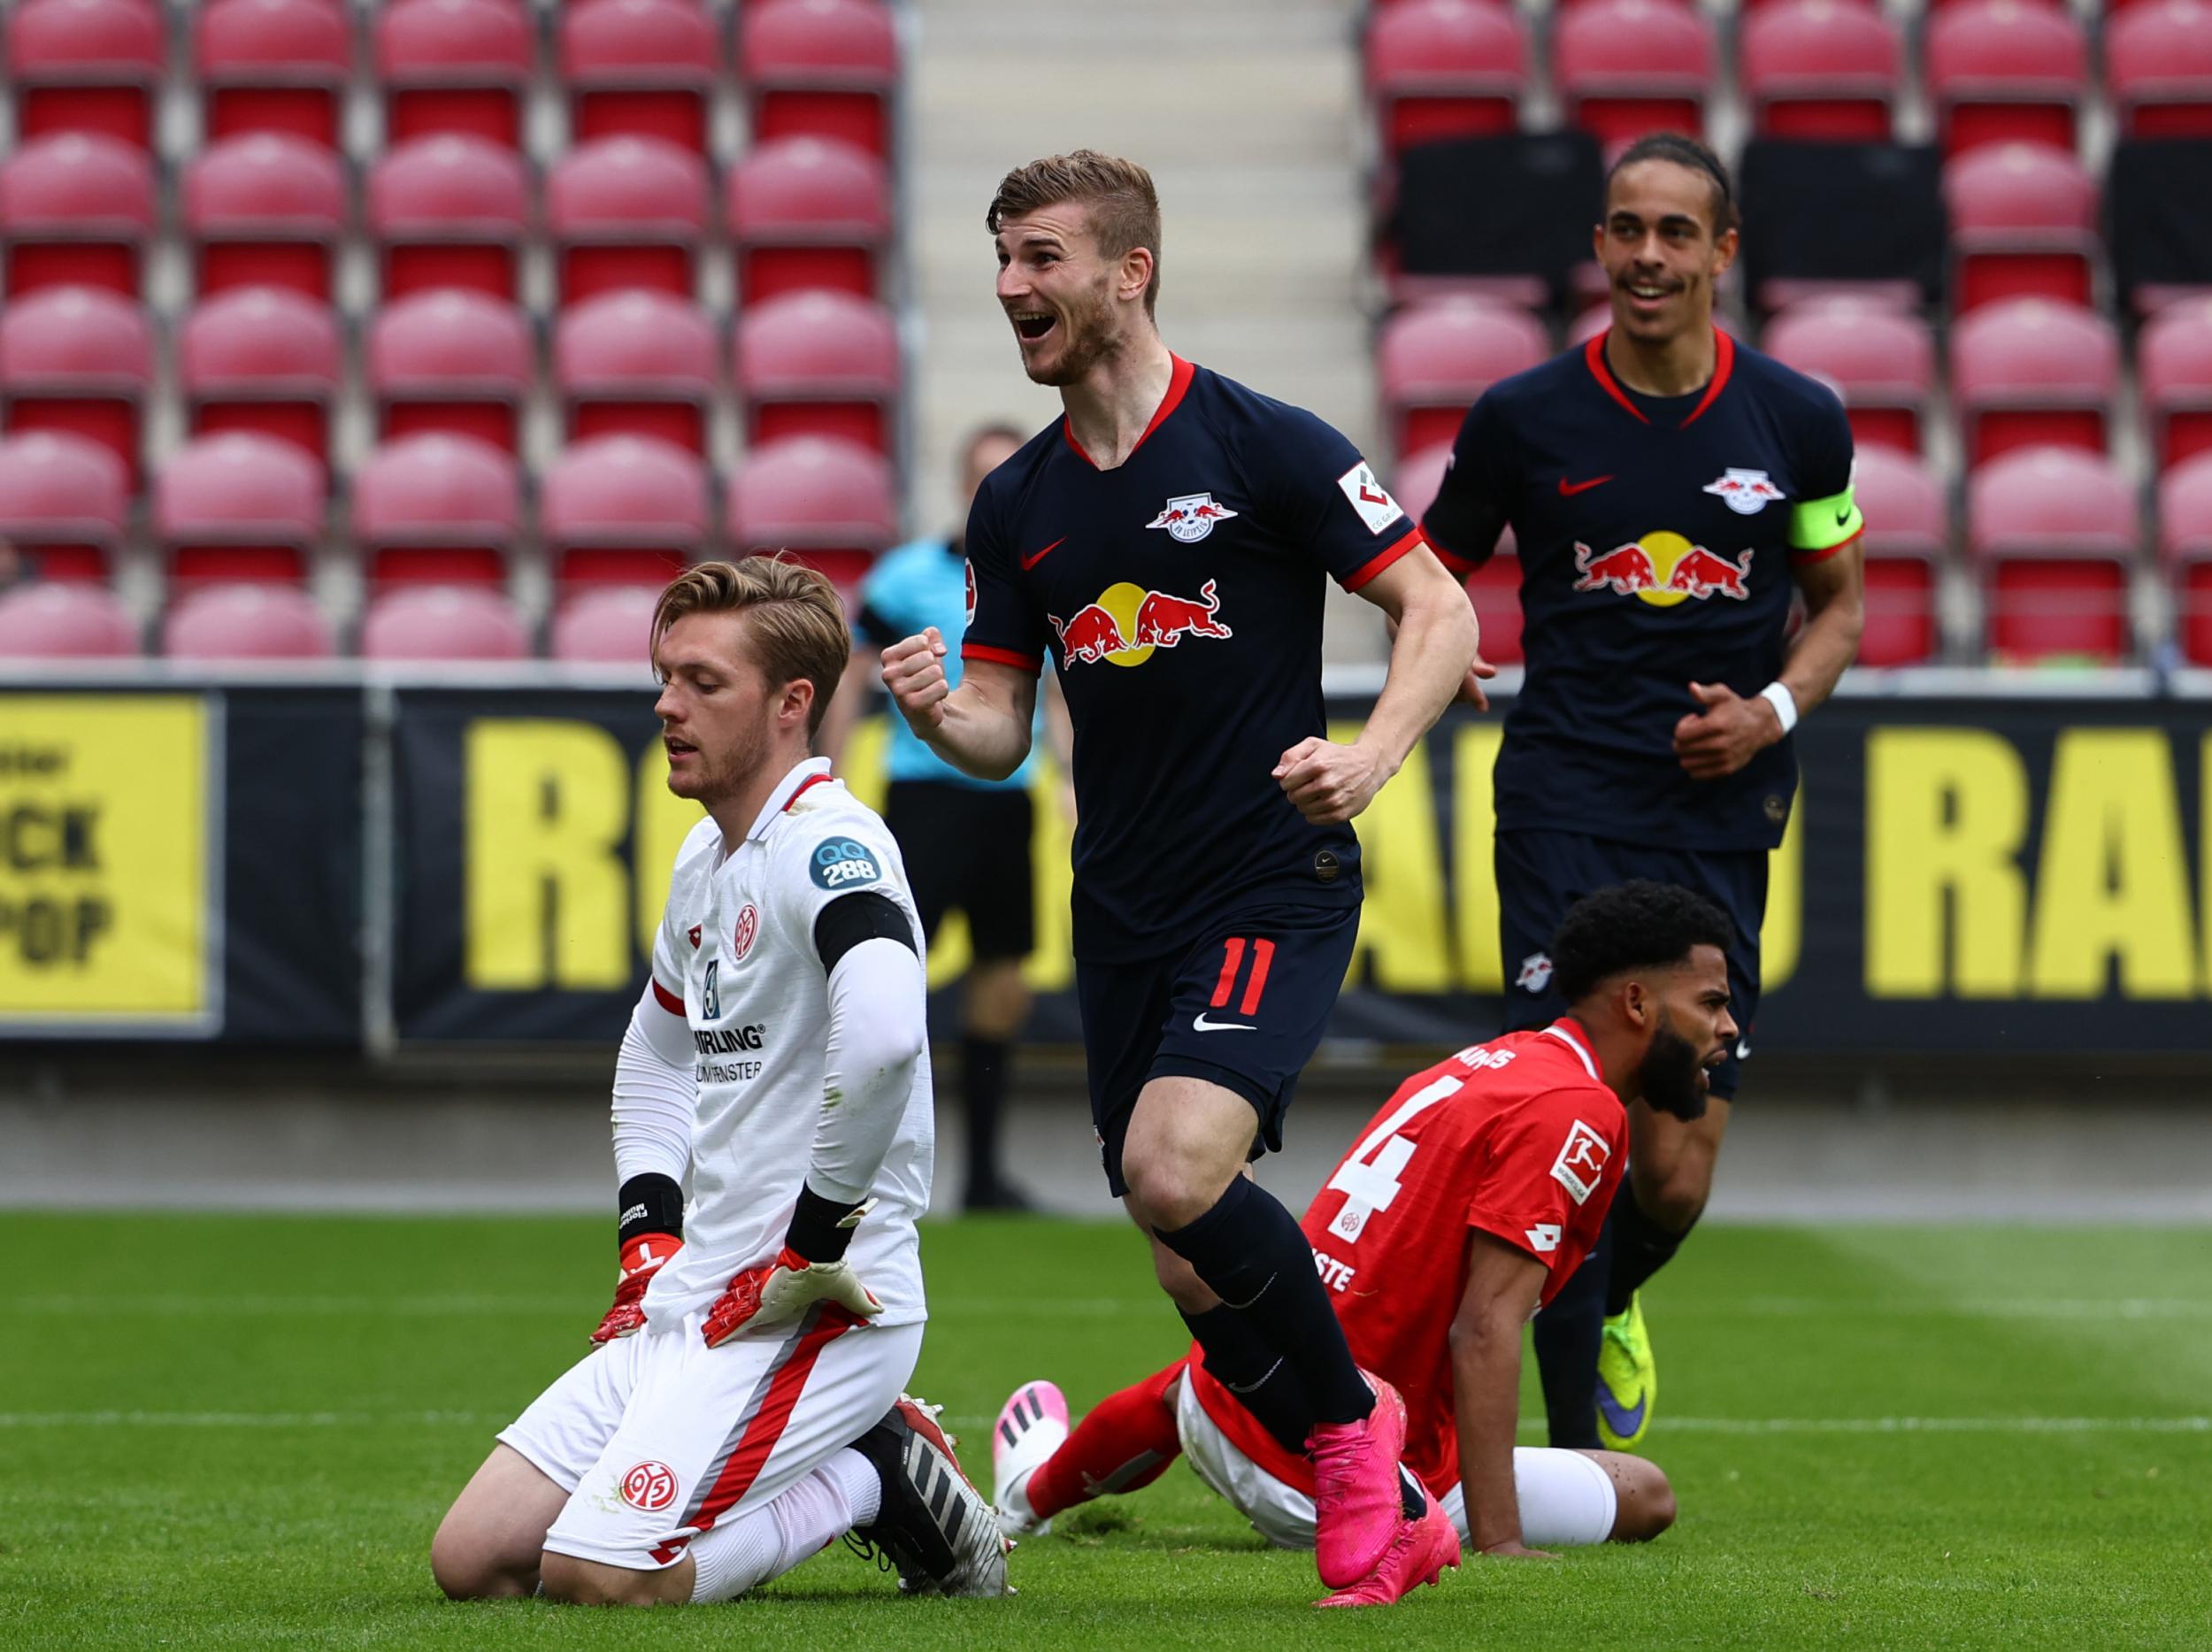 Bundesliga results: Timo Werner hits hat-trick for Leipzig while Schalke slump again